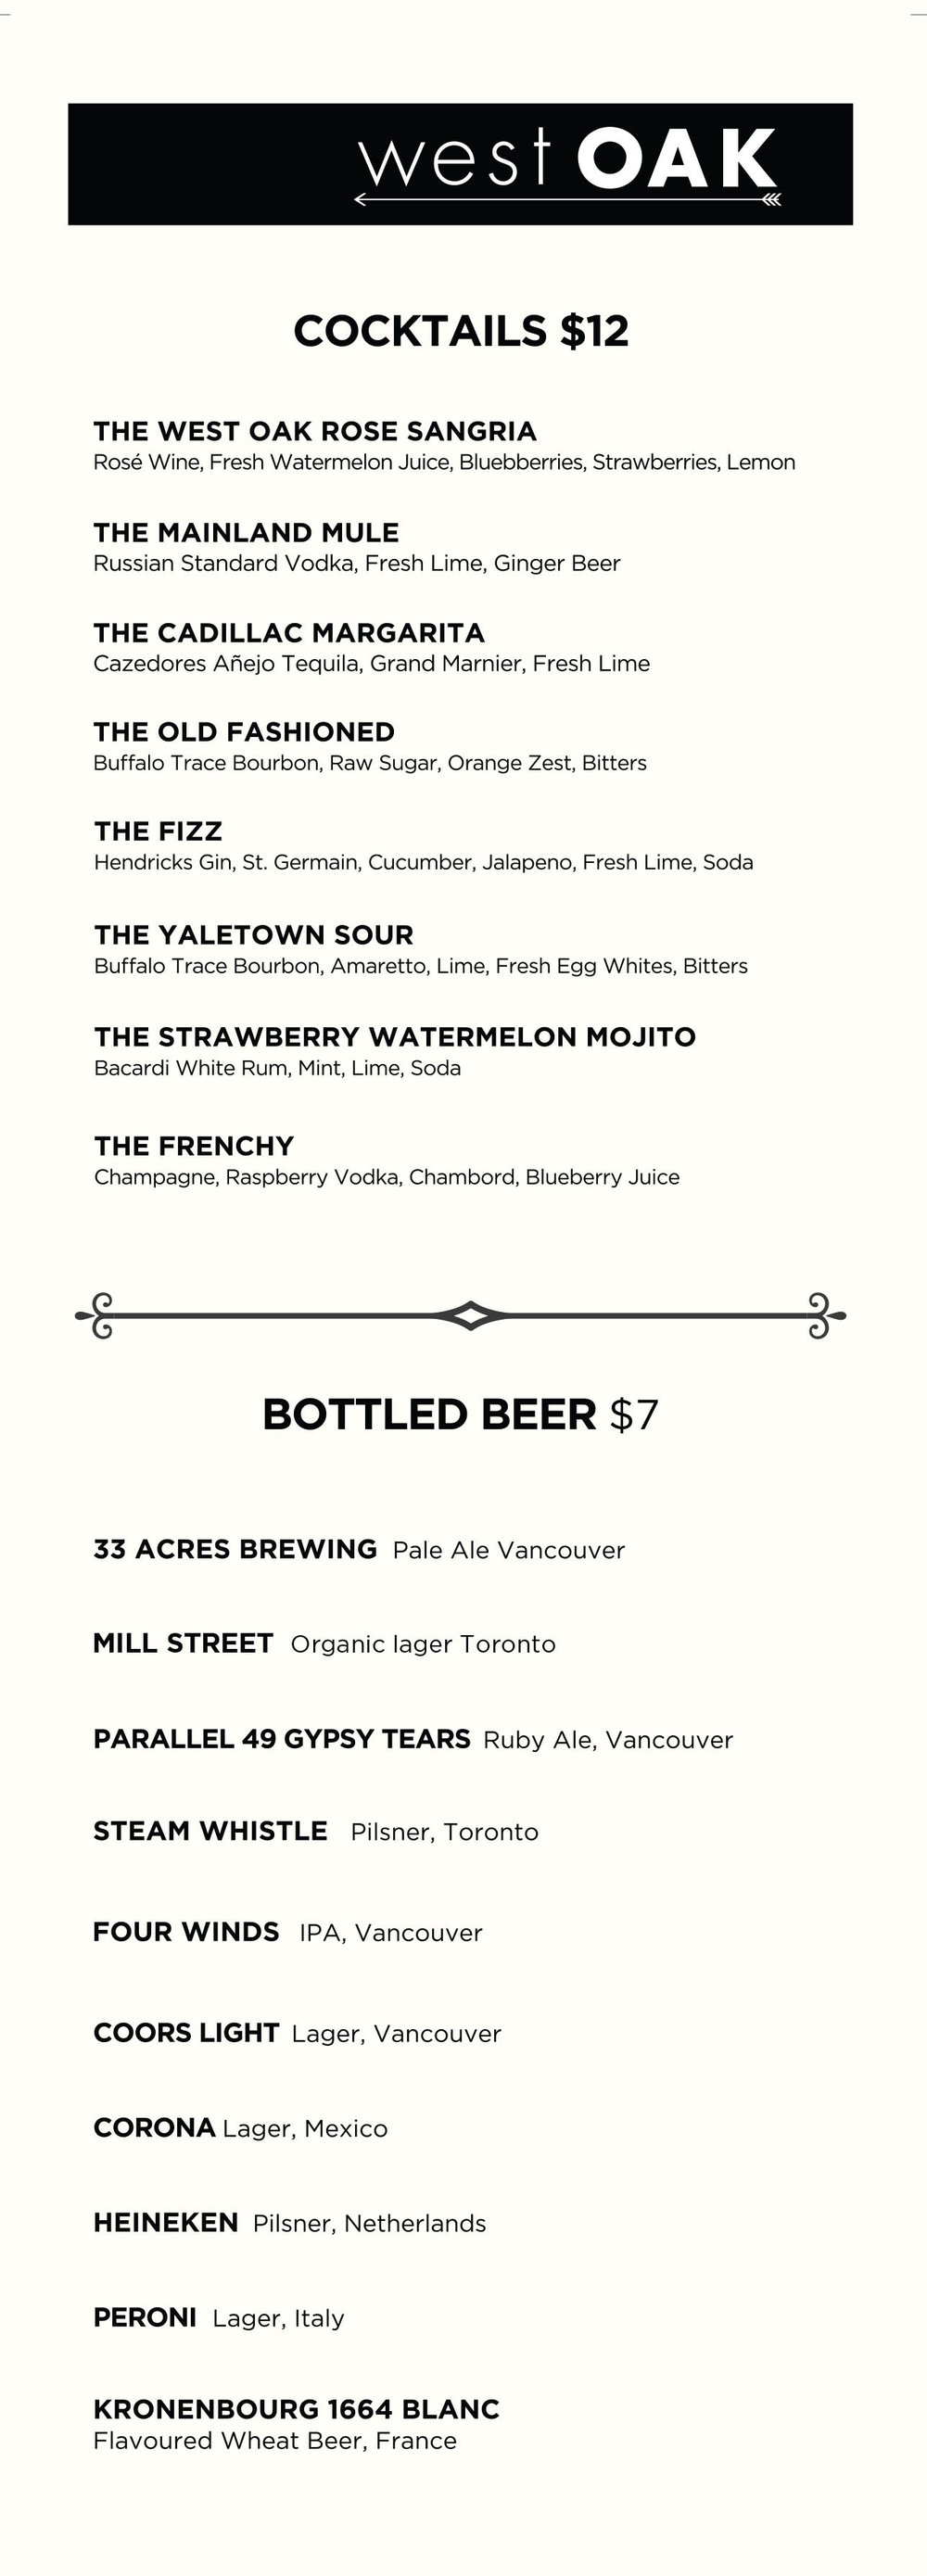 WestOak-Cocktail-Menu 2017-09-19.jpg